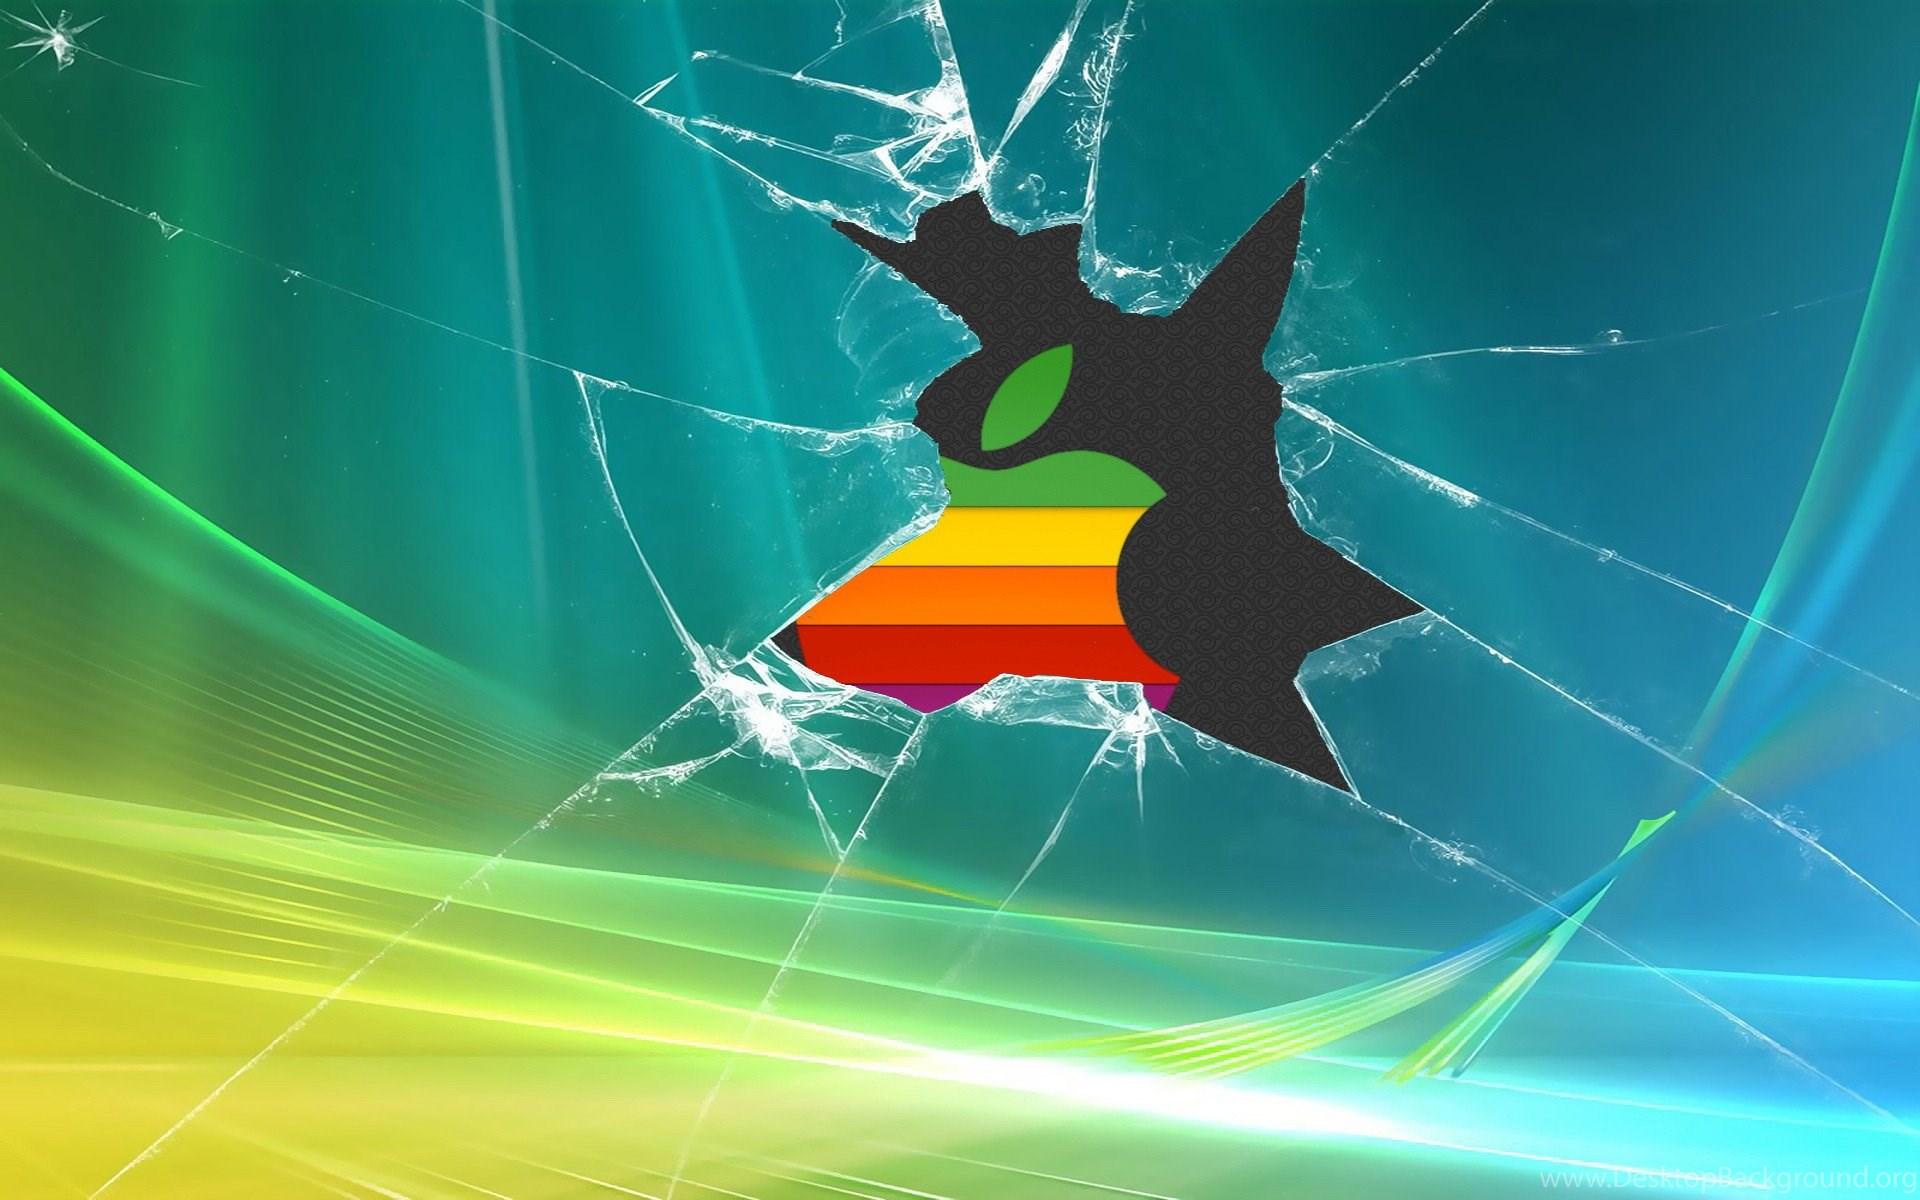 Retro Apple Logo Broken Windows Backgrounds Desktop